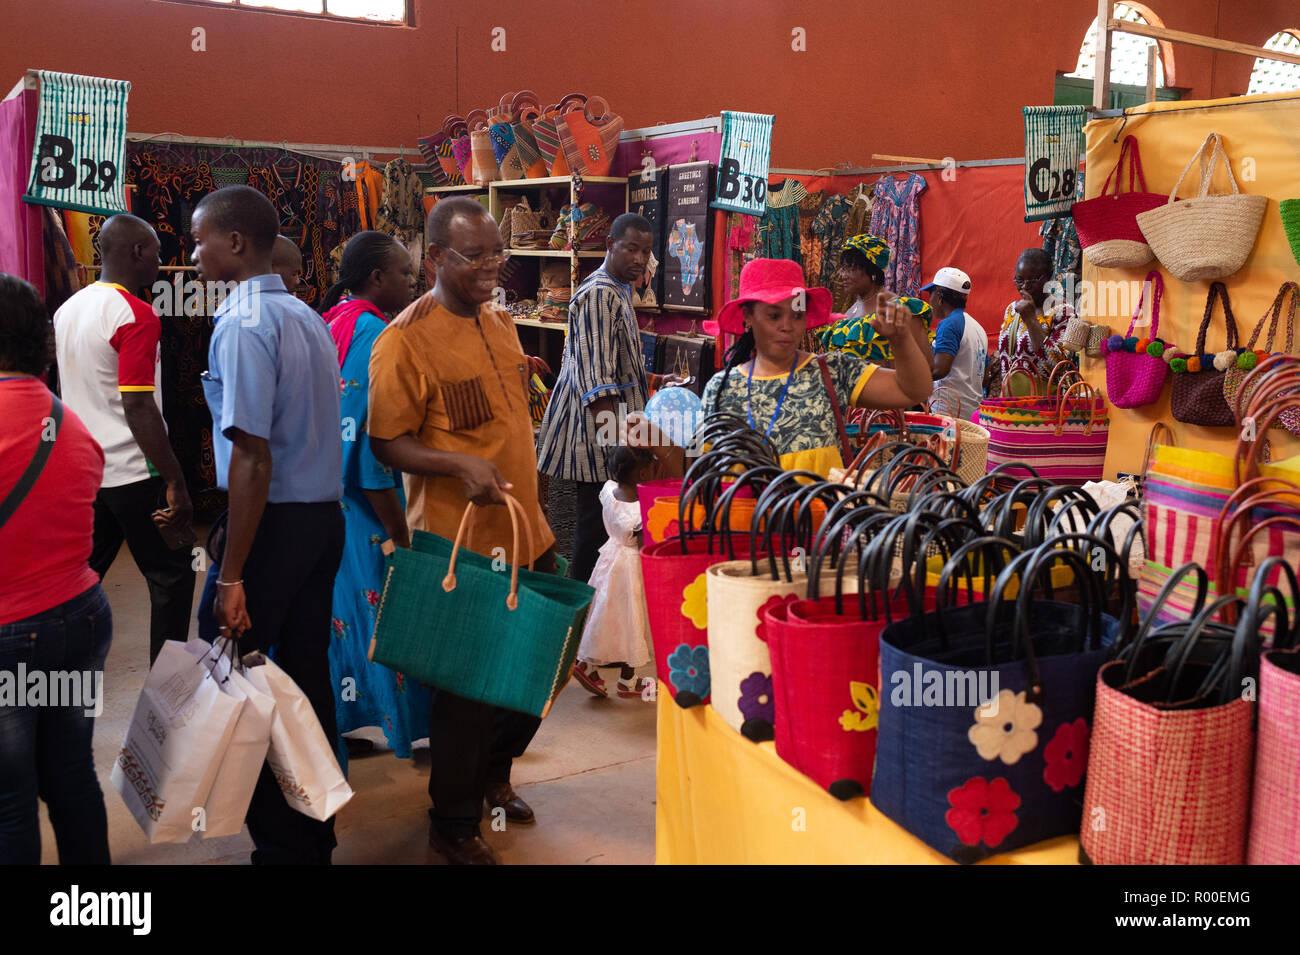 SIAO Ouagadougou, Internazionale di Arte e Artigianato Trade Show, Fiera regionale, 26 ottobre - 04 nov. 2018, Ougadoungou, Burkina Faso, Africa Foto Stock